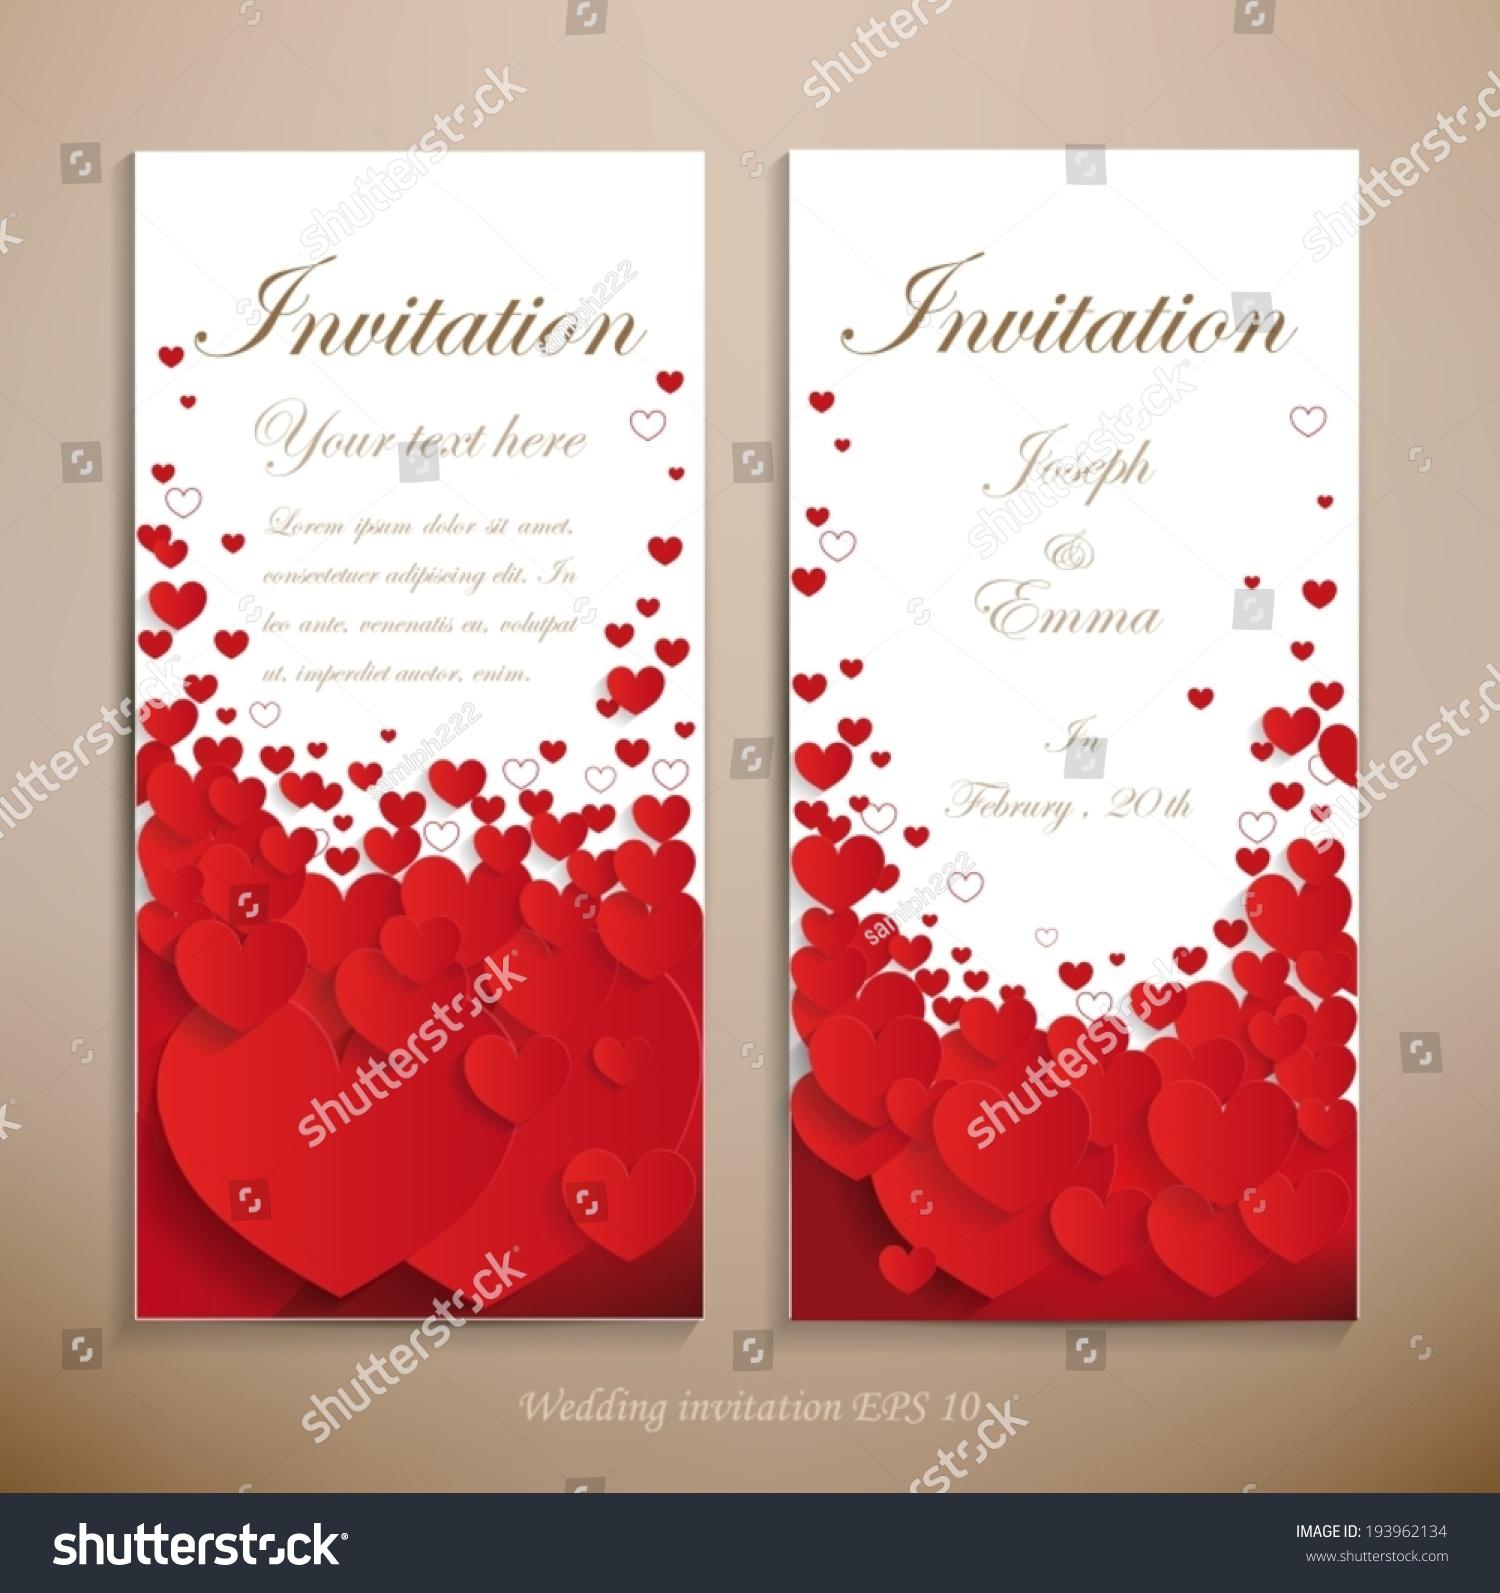 Lovely Wedding Invitation Beautiful Wedding Invitation Stock Vector ...